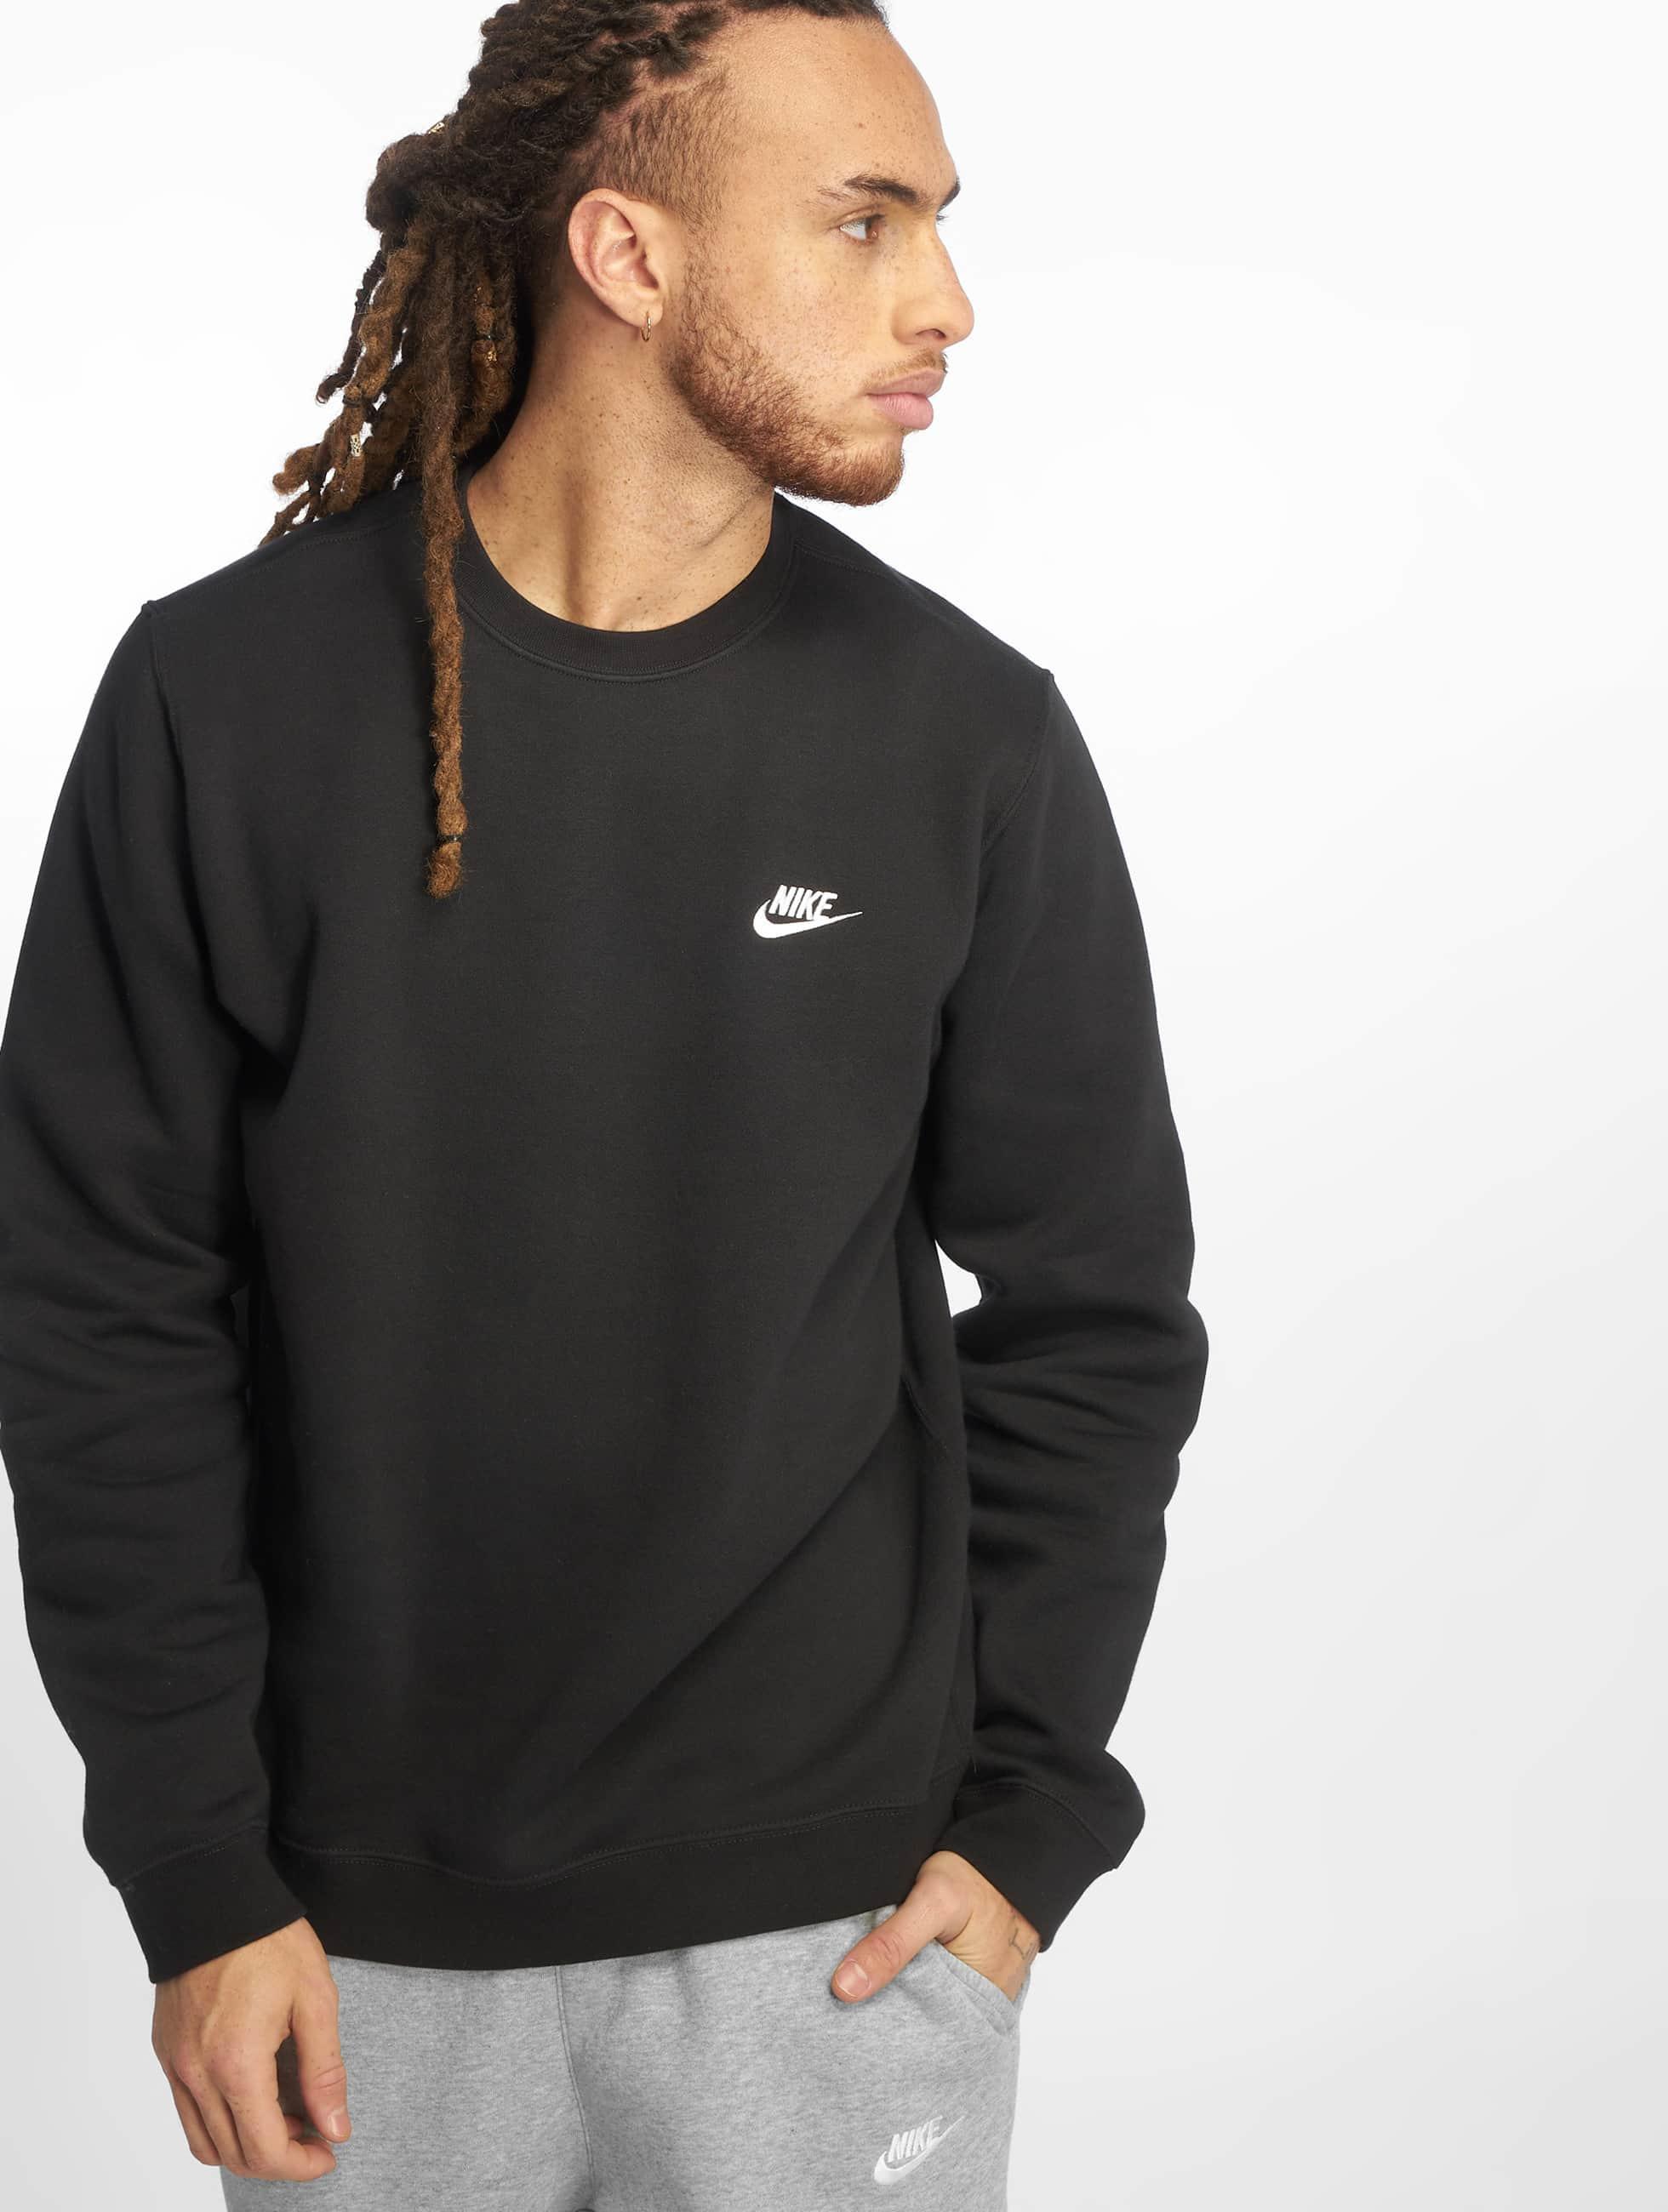 Pullover Herren Nike